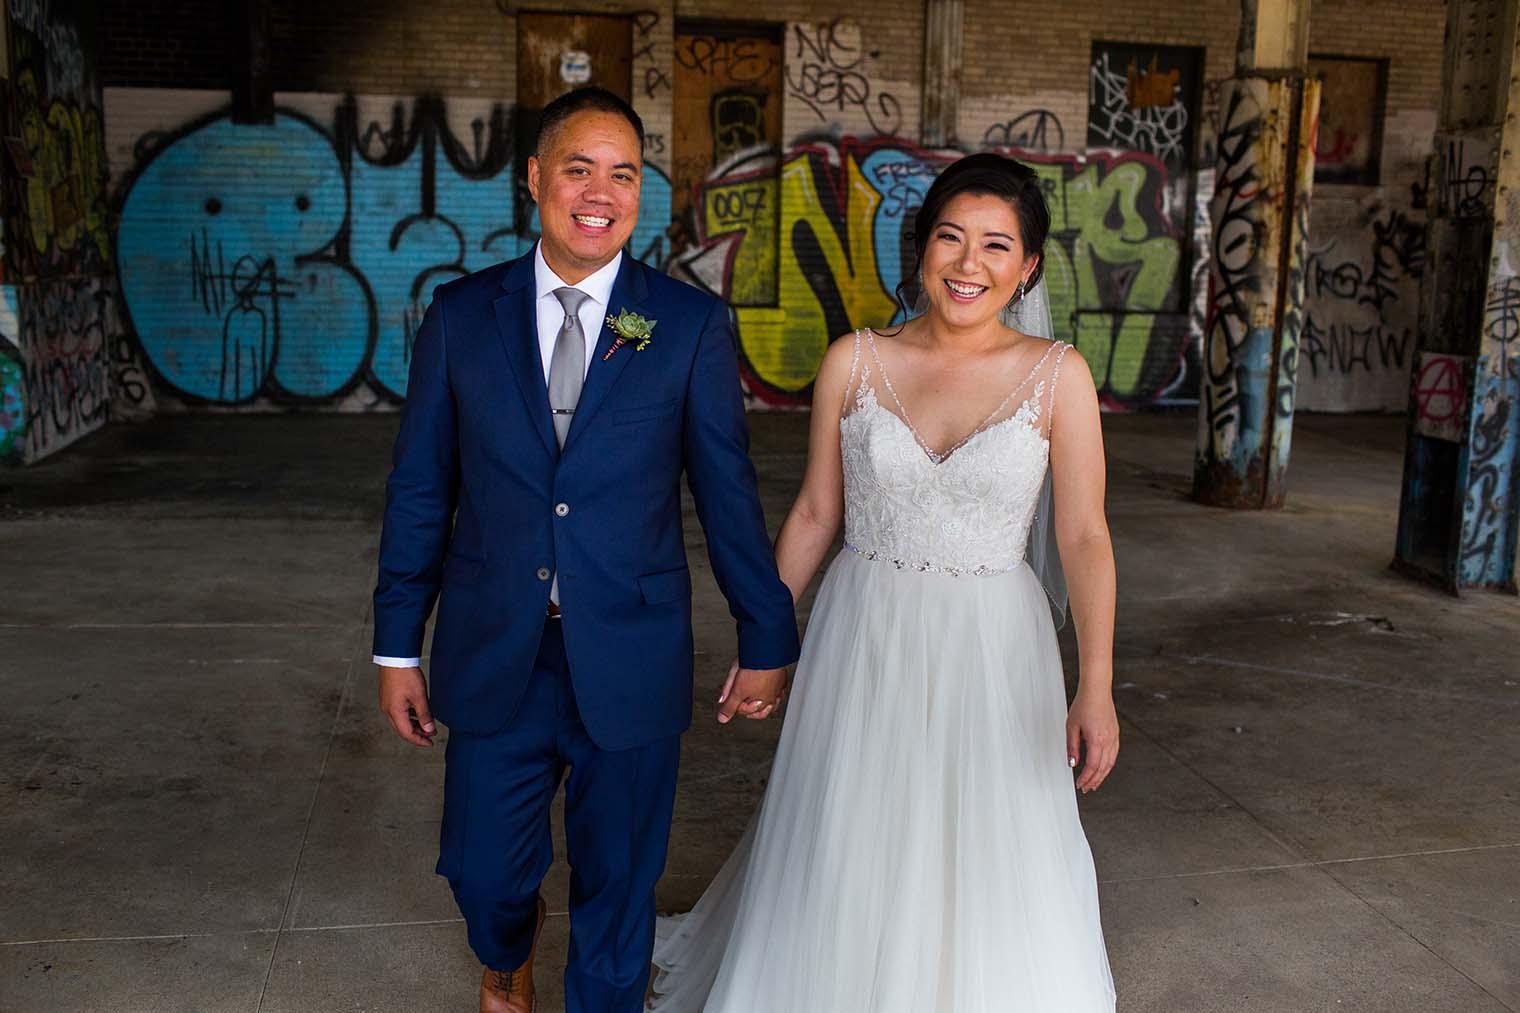 16th Street Station Wedding Couple Photos